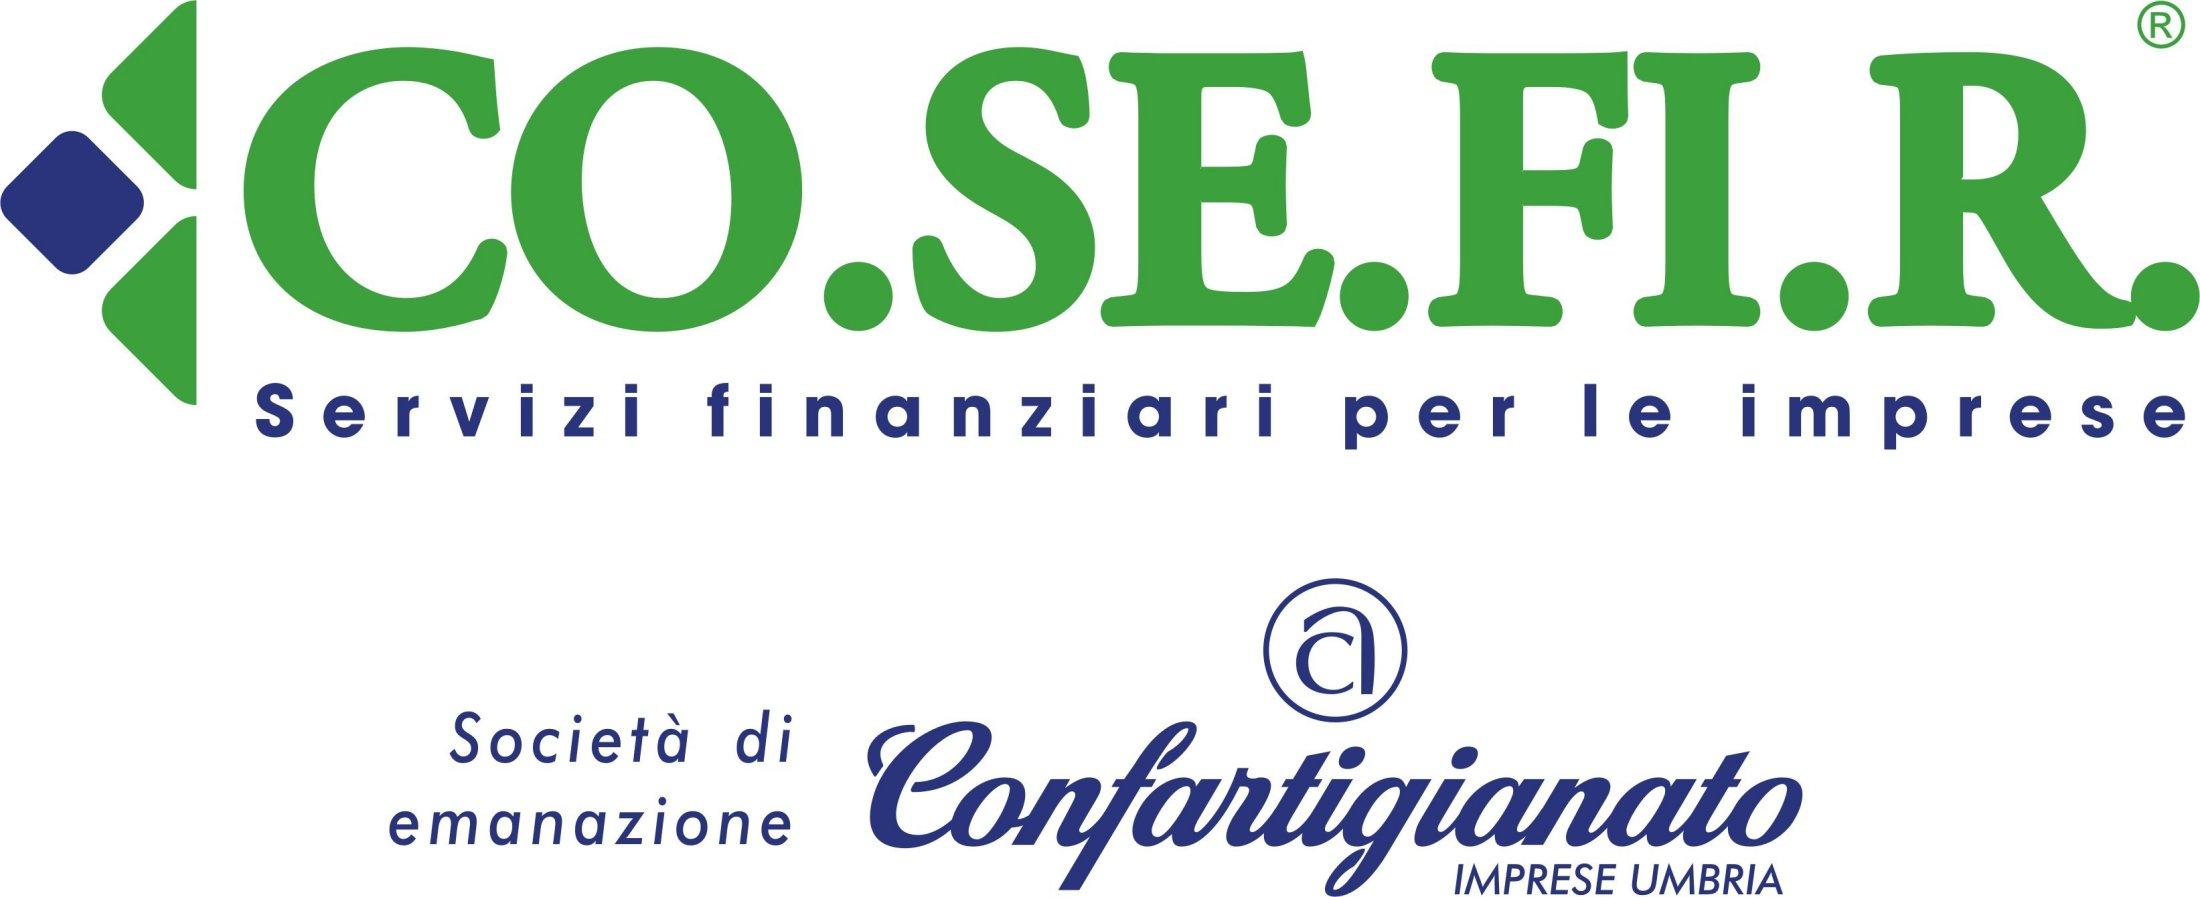 Logo Cosefir